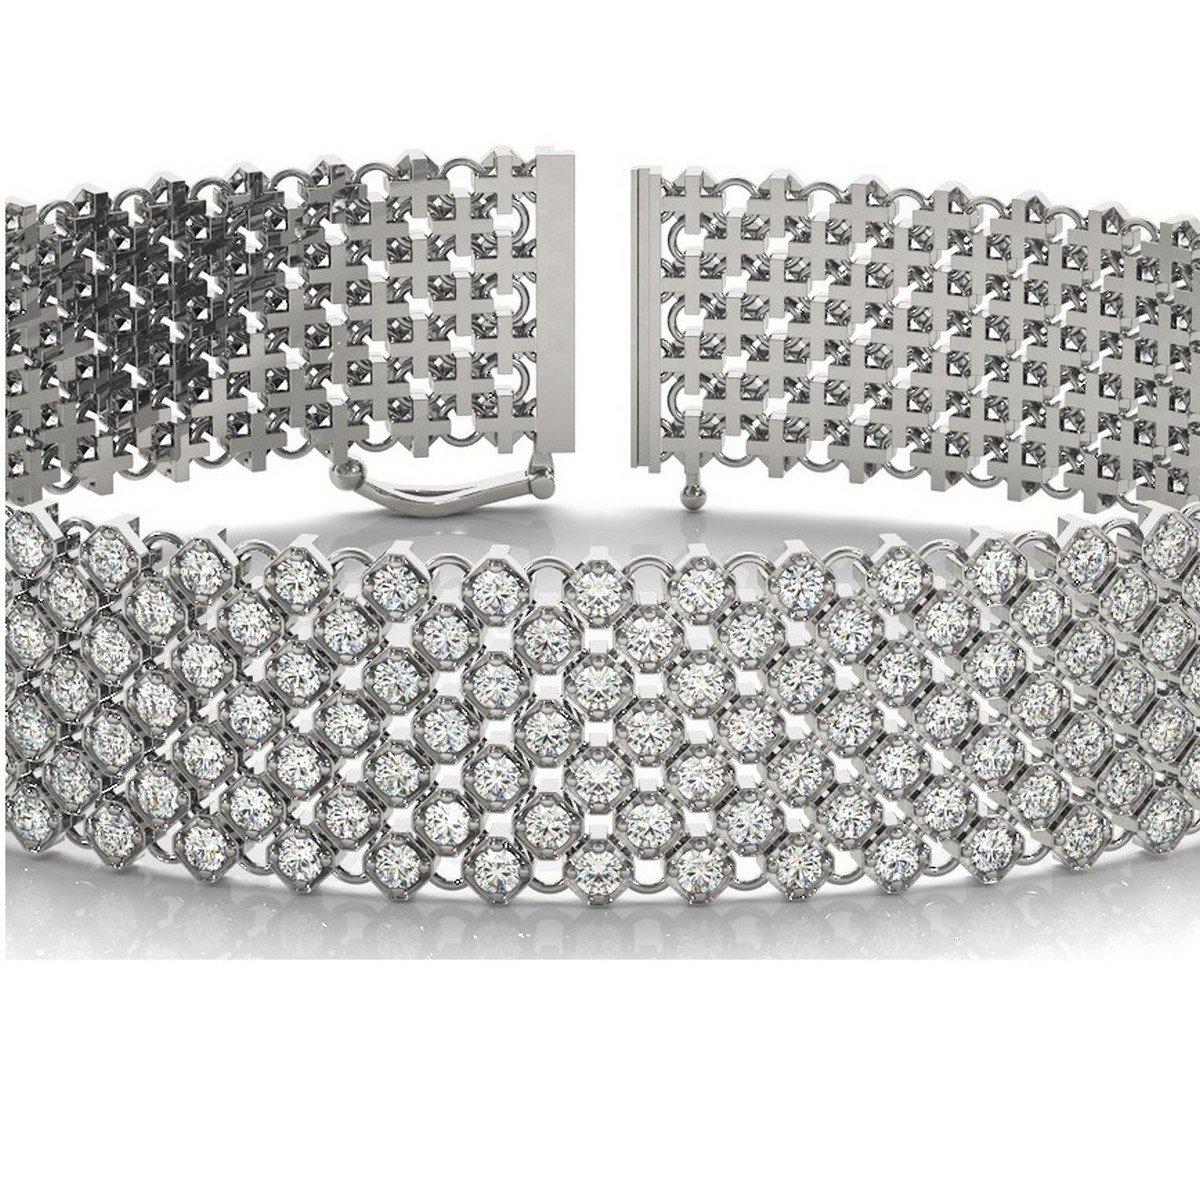 18k Gold Diamond Multi-Row Wide Luxury Bridal Bracelet 4.16ct